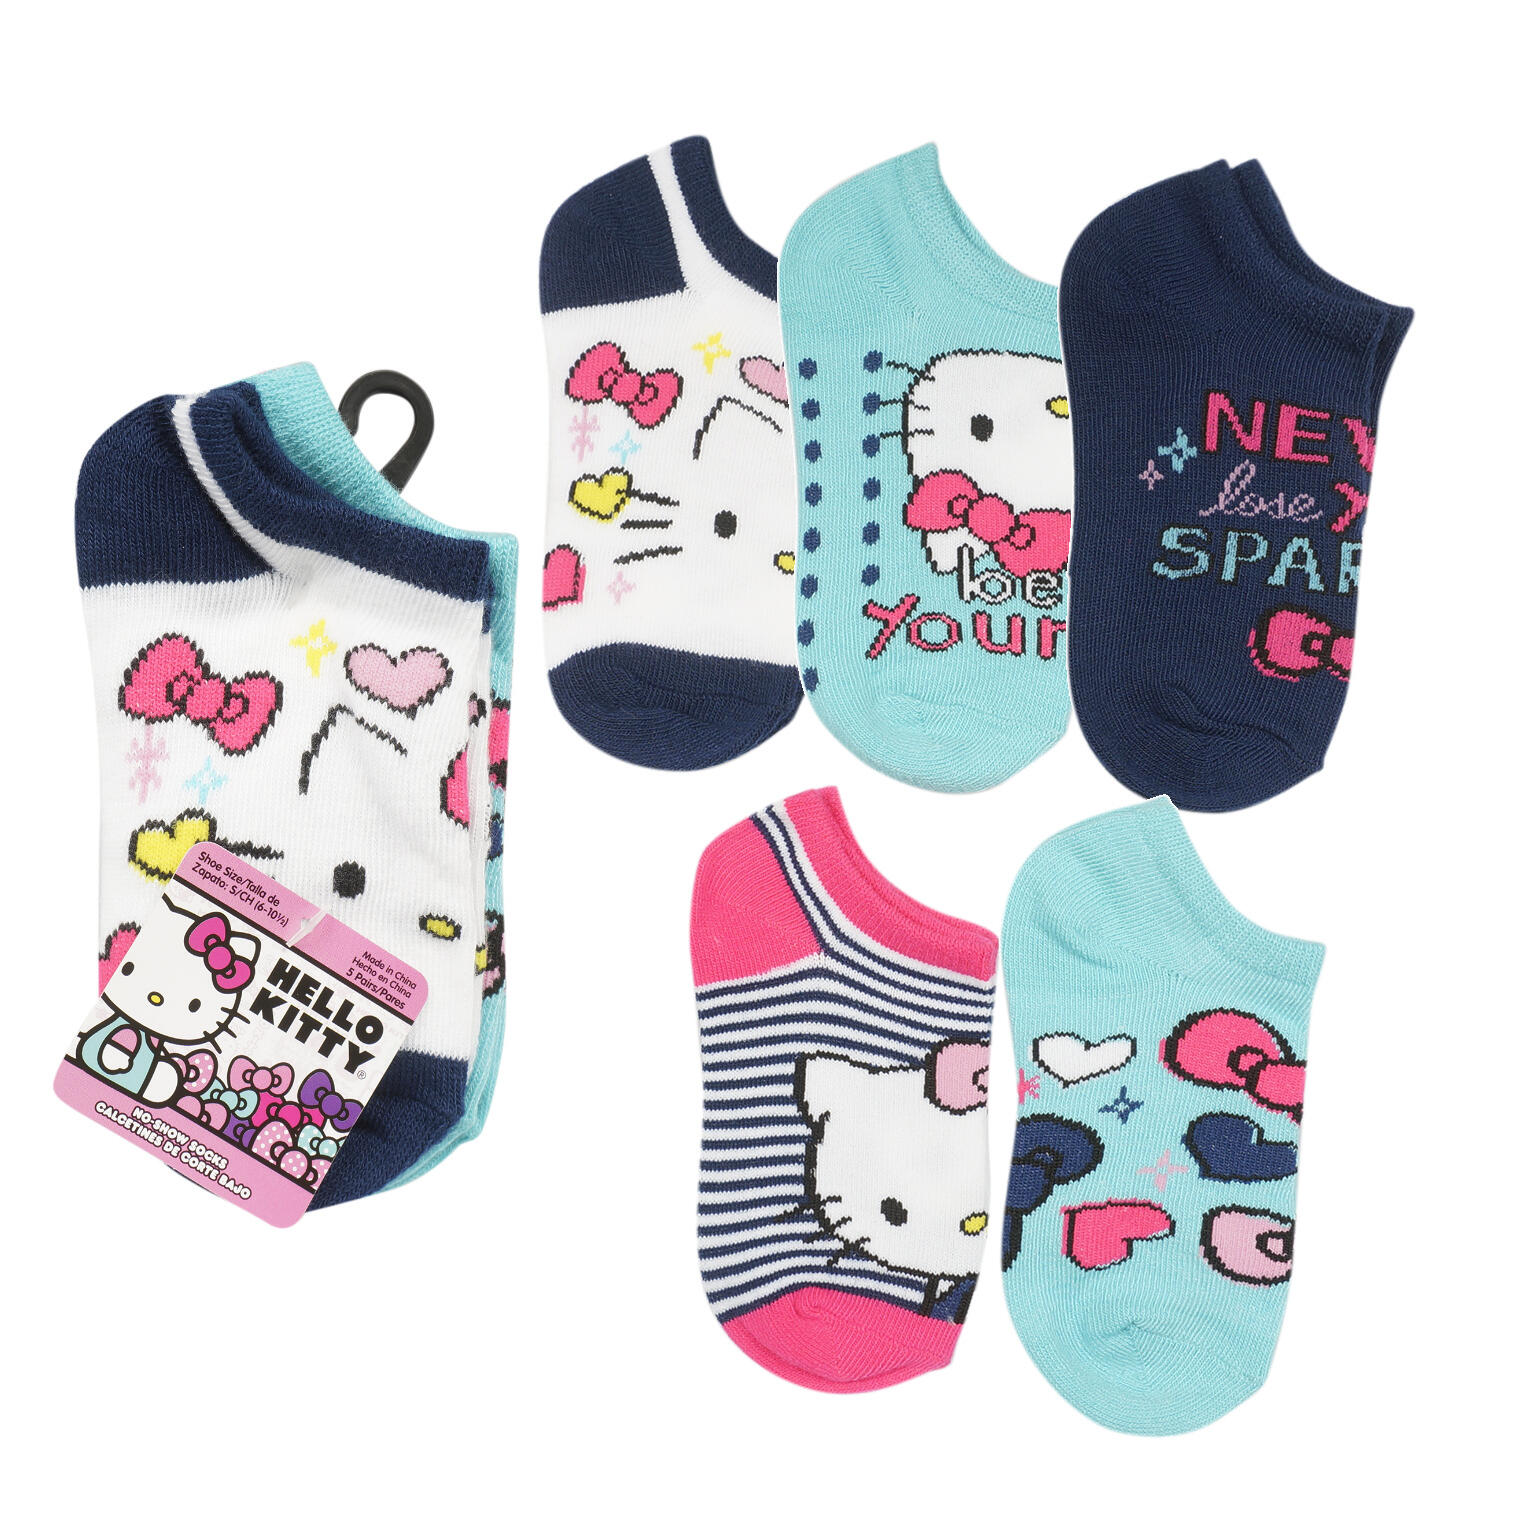 CATSDER Friends Kitties Boxer Briefs Mens Underwear Pack Seamless Comfort Soft